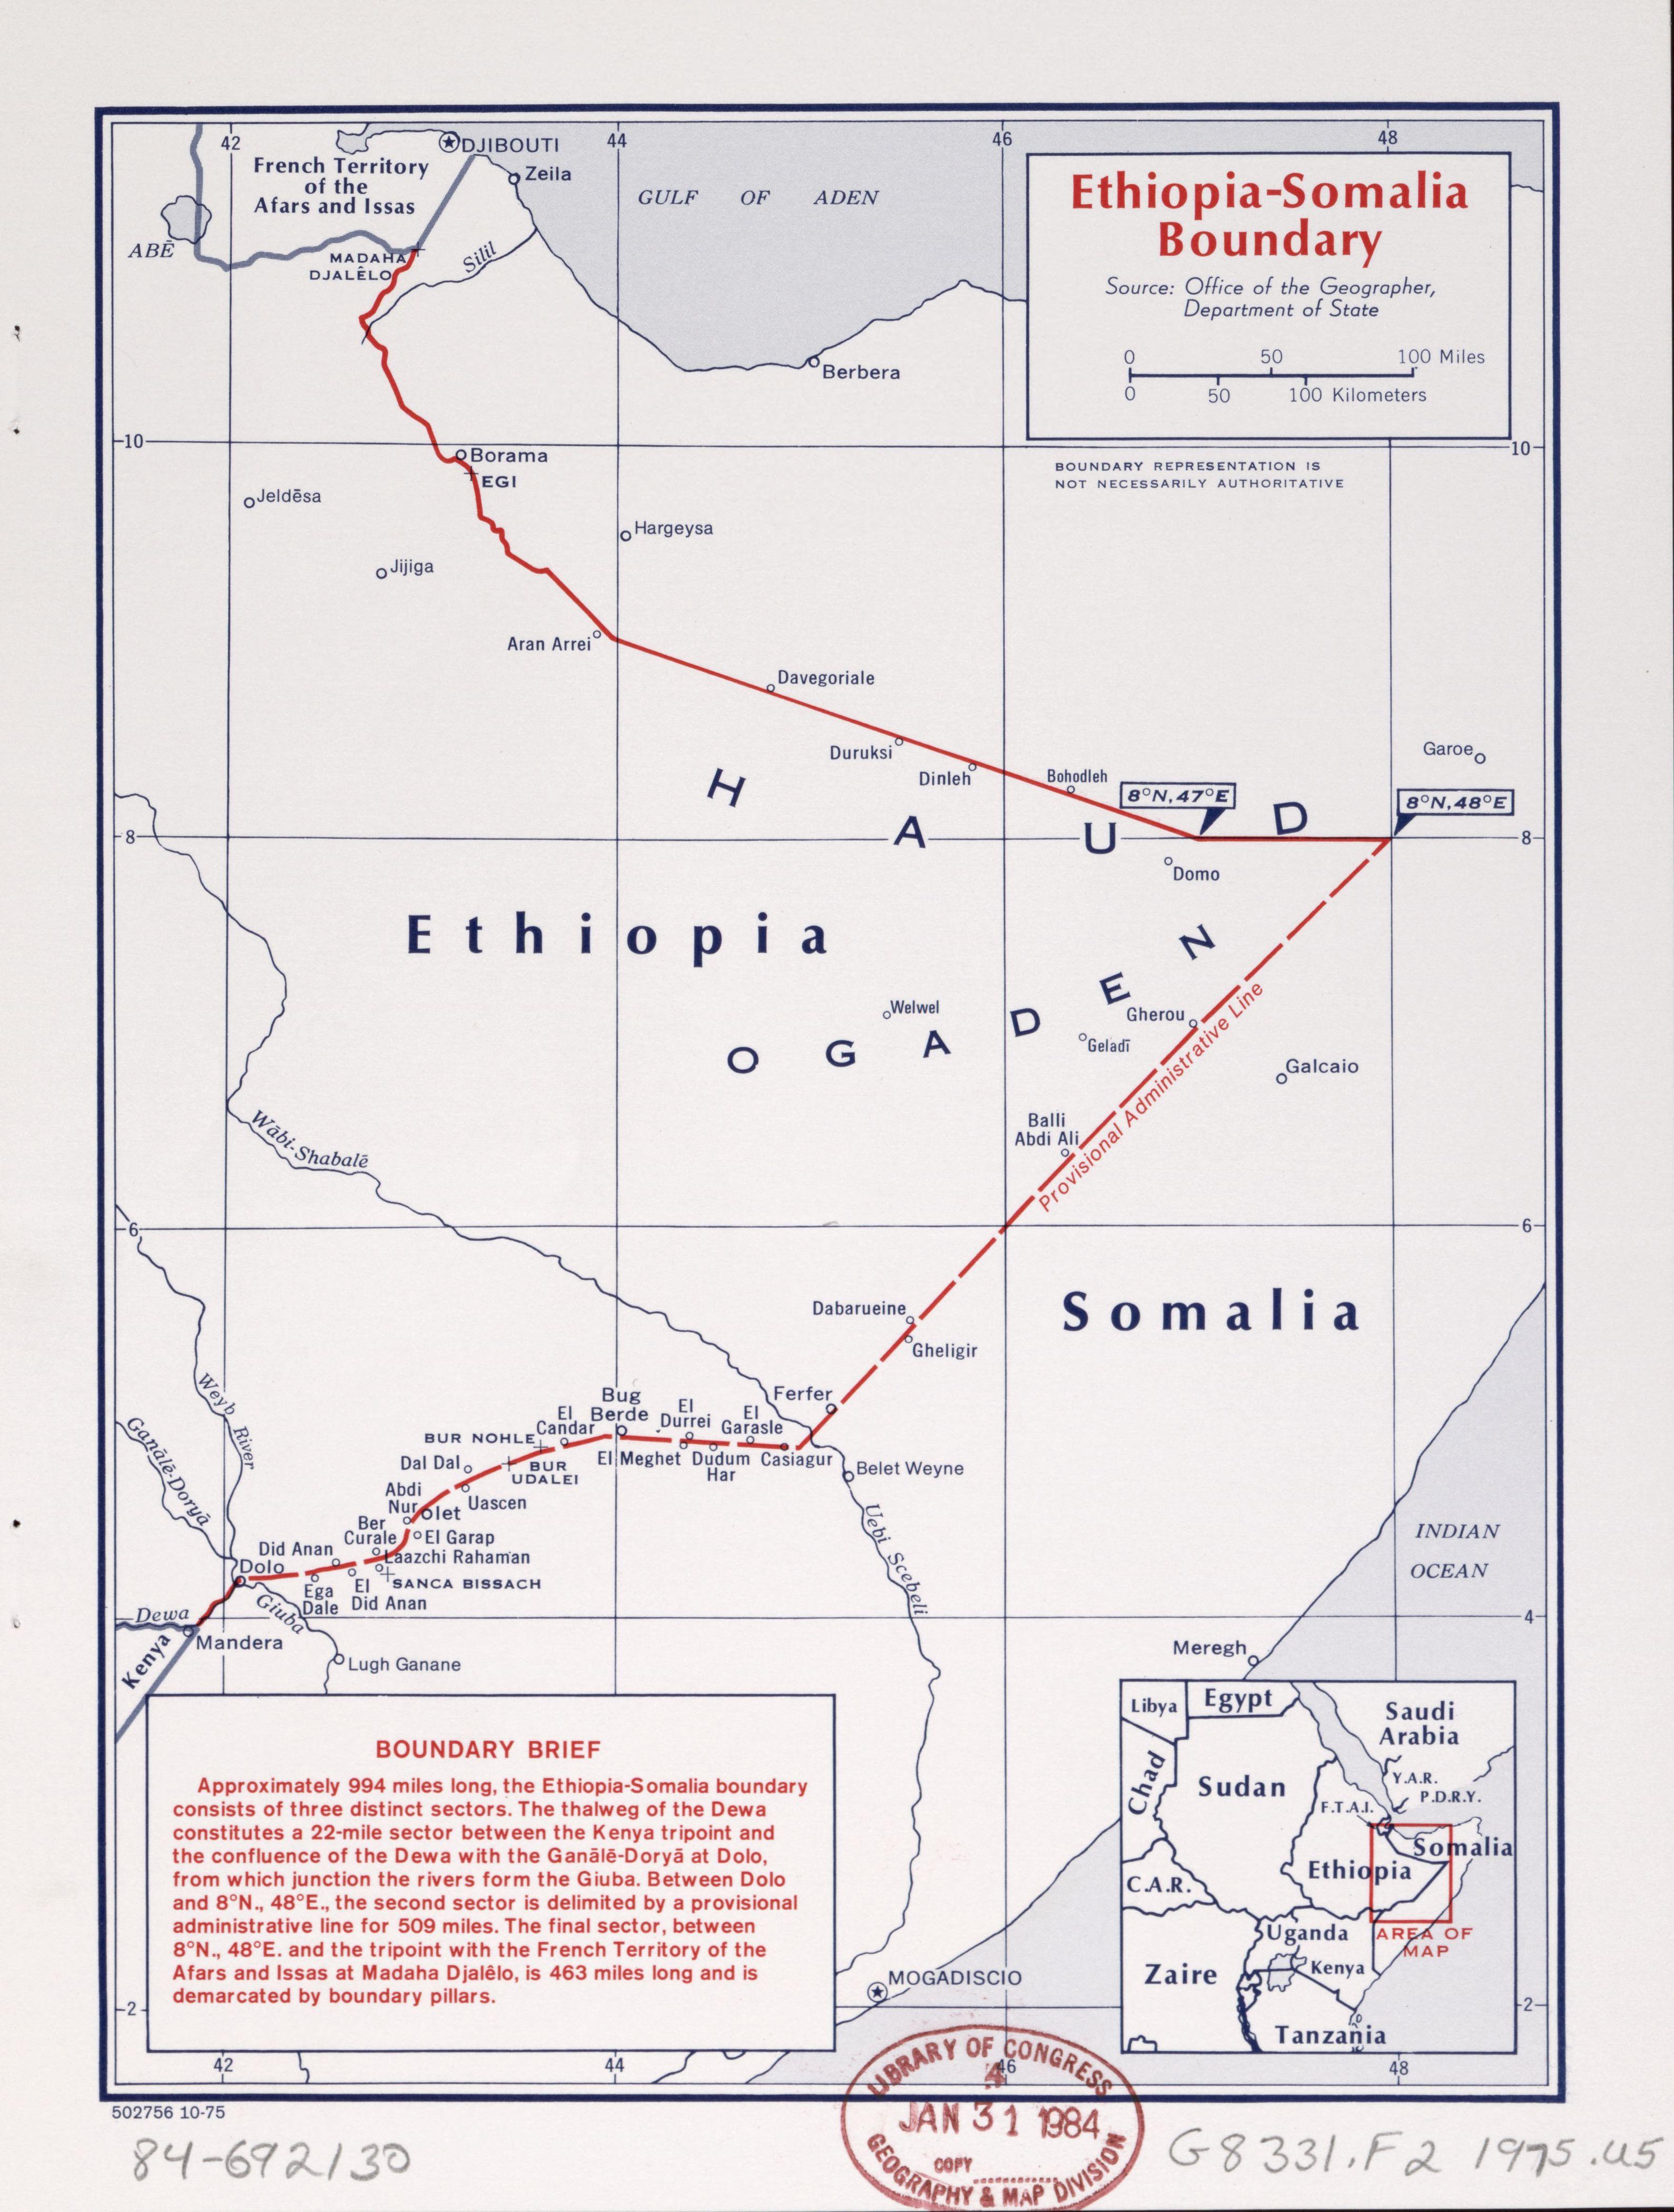 File:Ethiopia-Somalia boundary  LOC 84692130 jpg - Wikimedia Commons